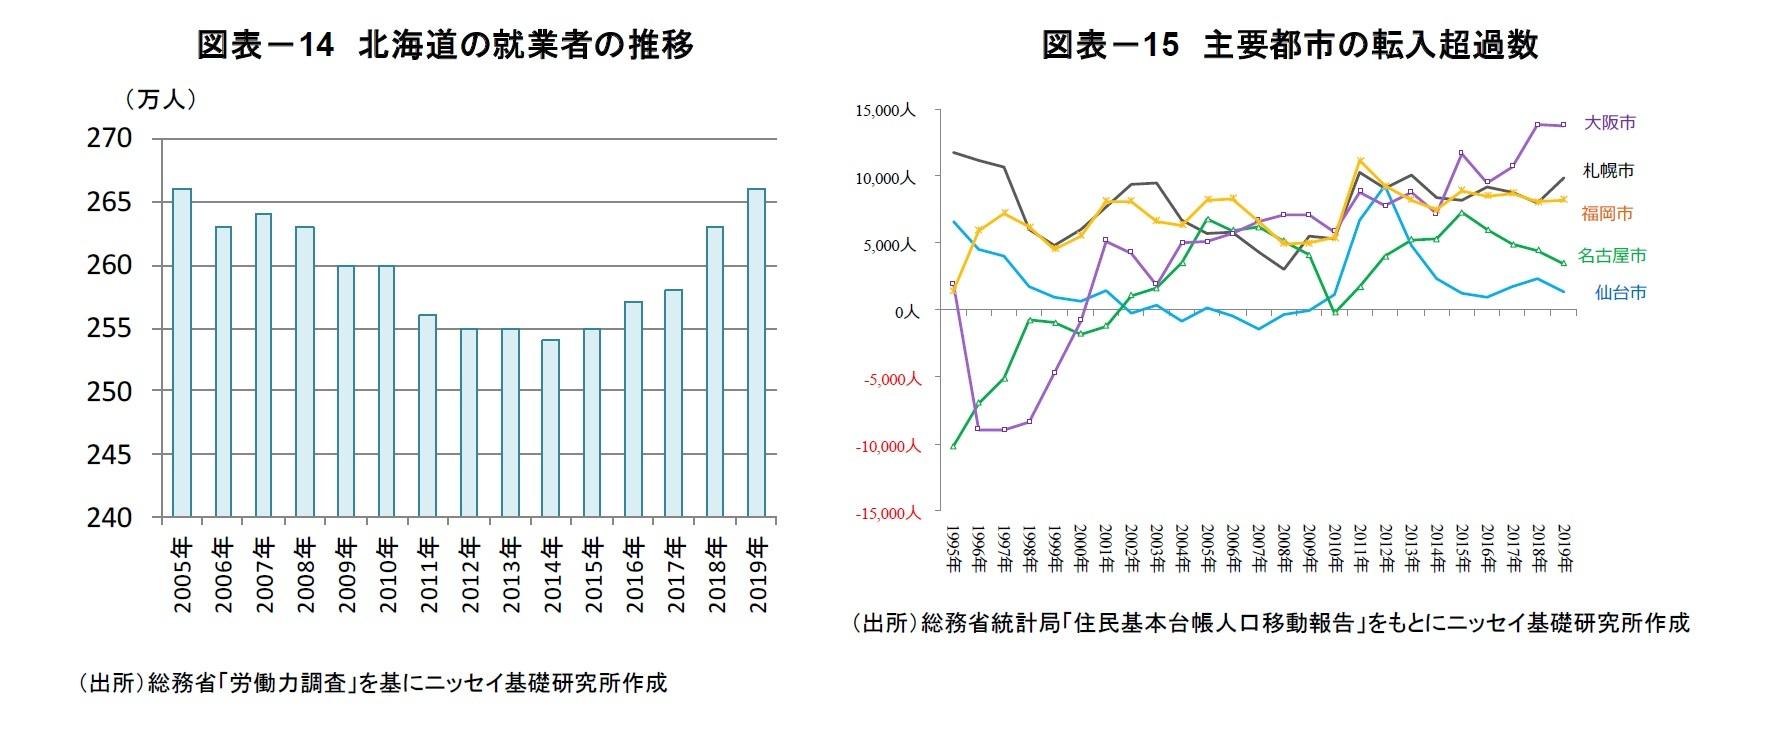 図表-14 北海道の就業者の推移/図表-15 主要都市の転入超過数